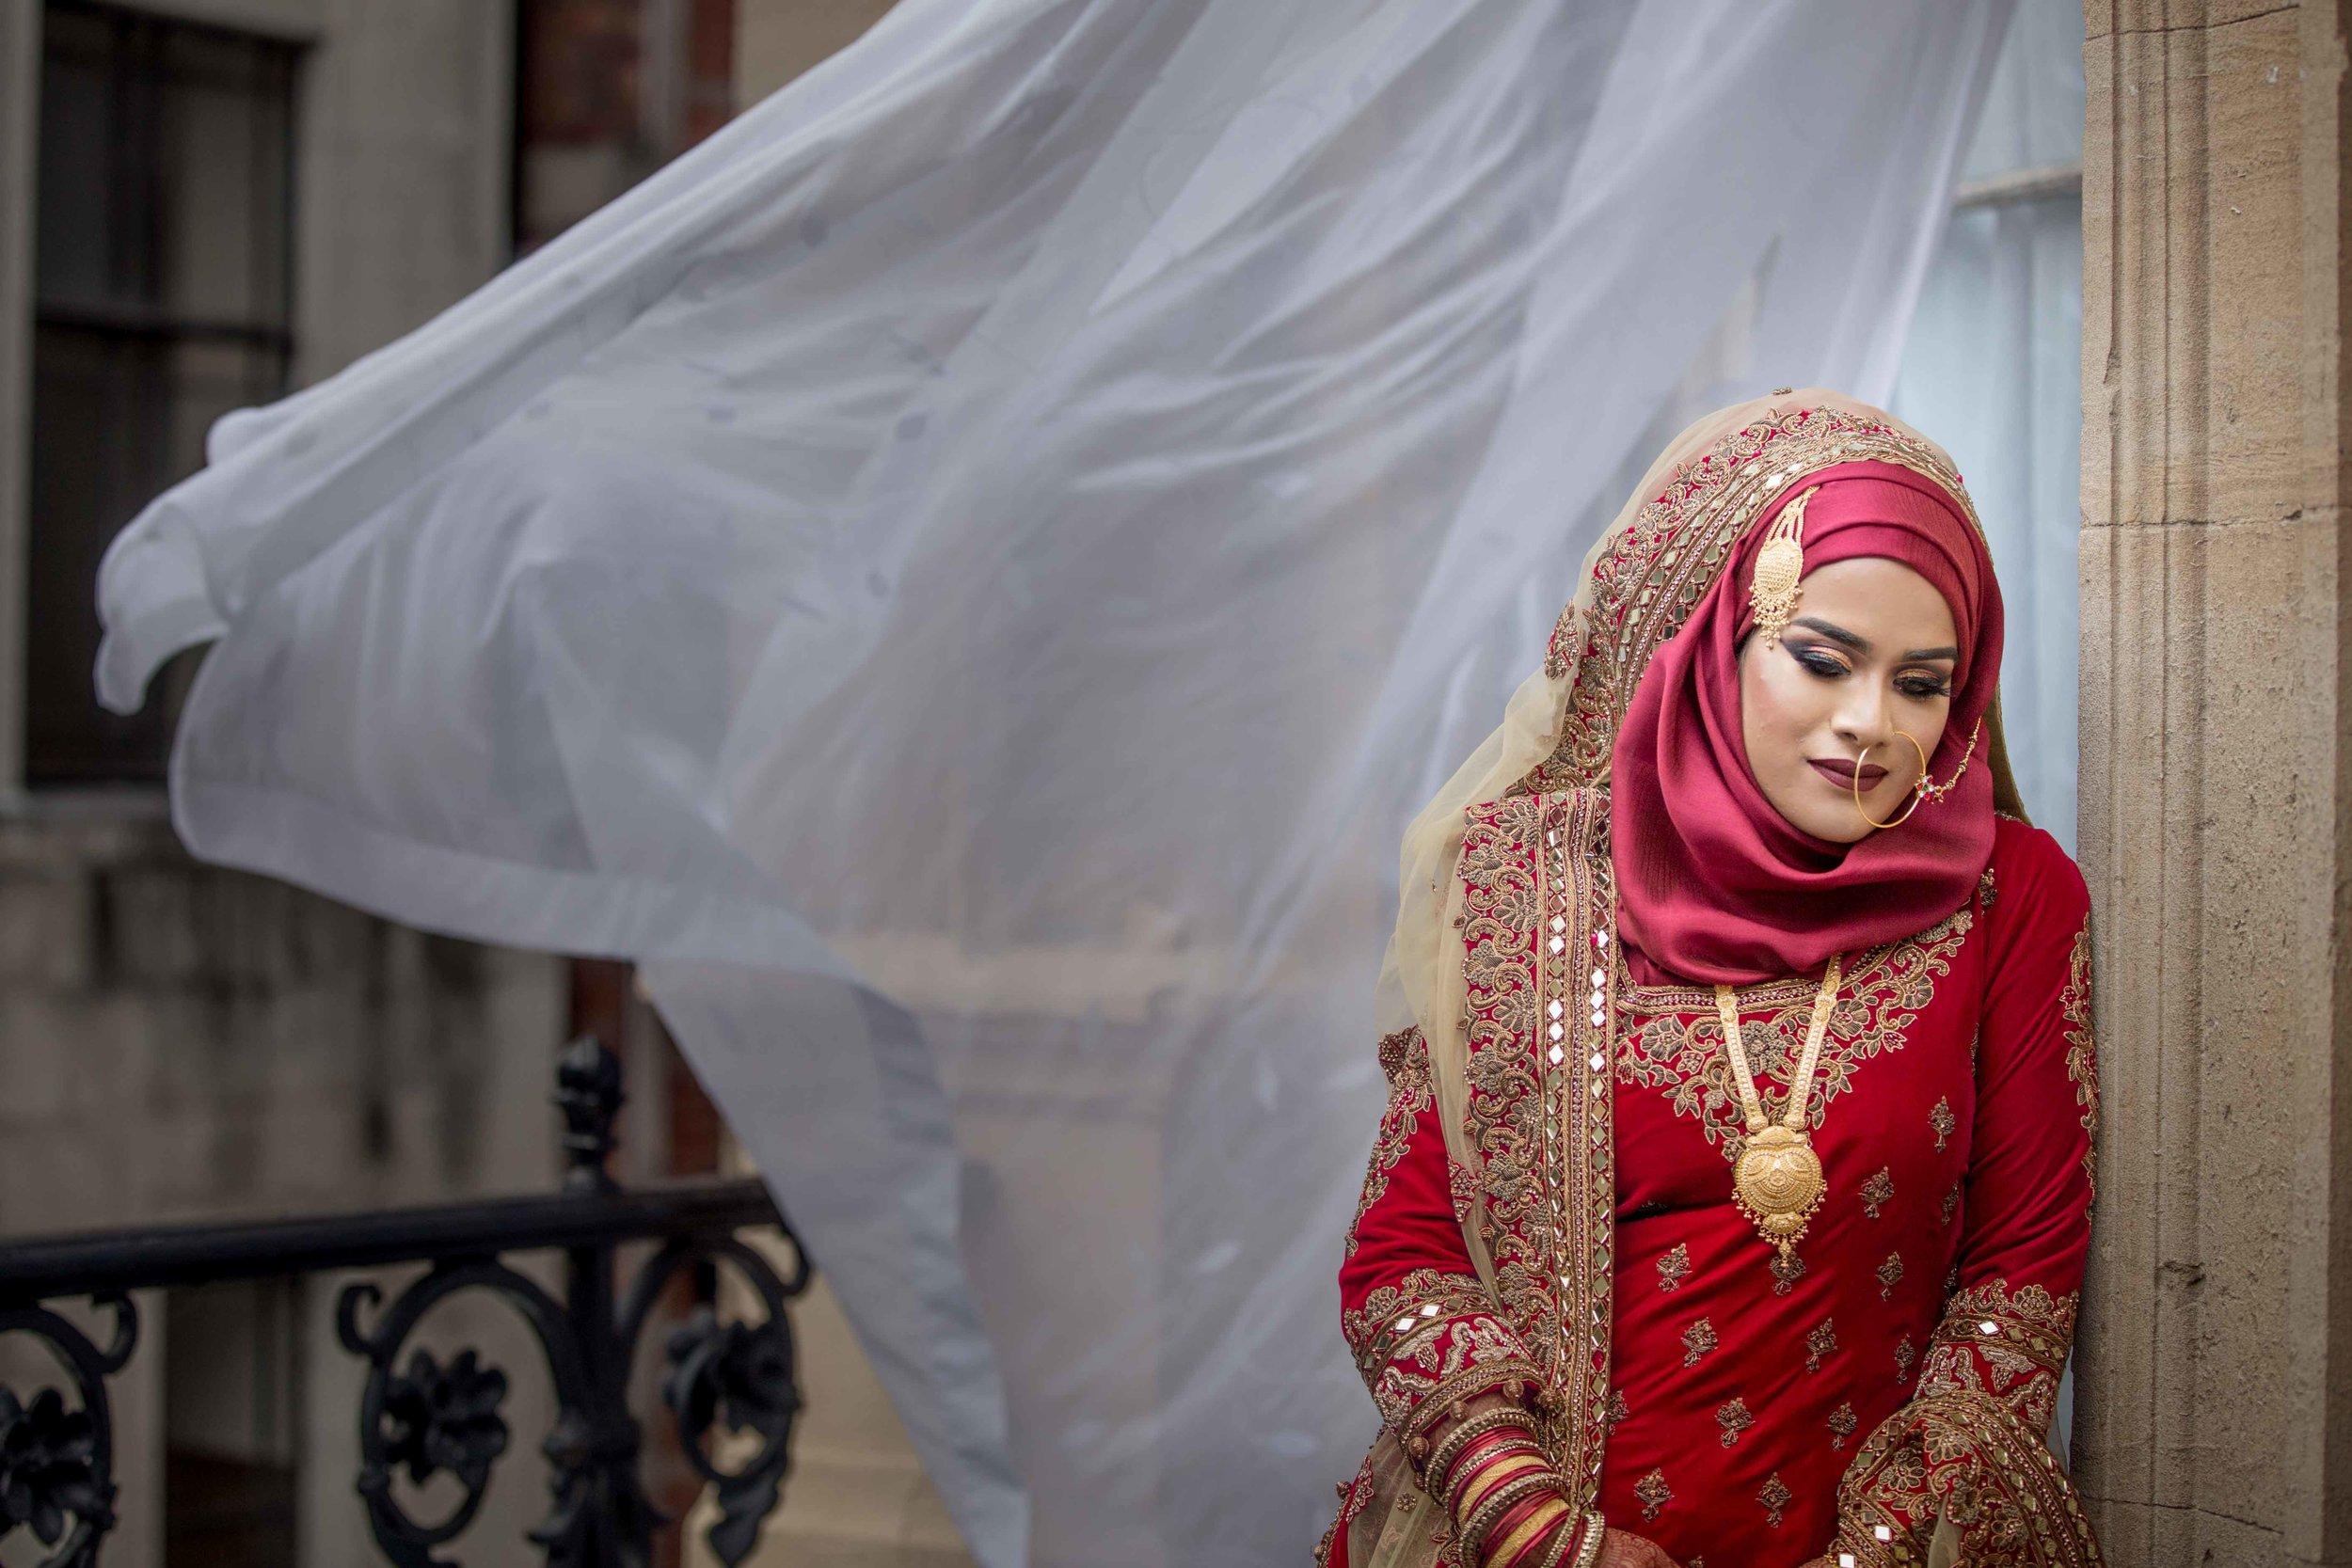 Female-wedding-photographer-bristol-mercure-bristol-grand-hotel-natalia-smith-photography-10.jpg